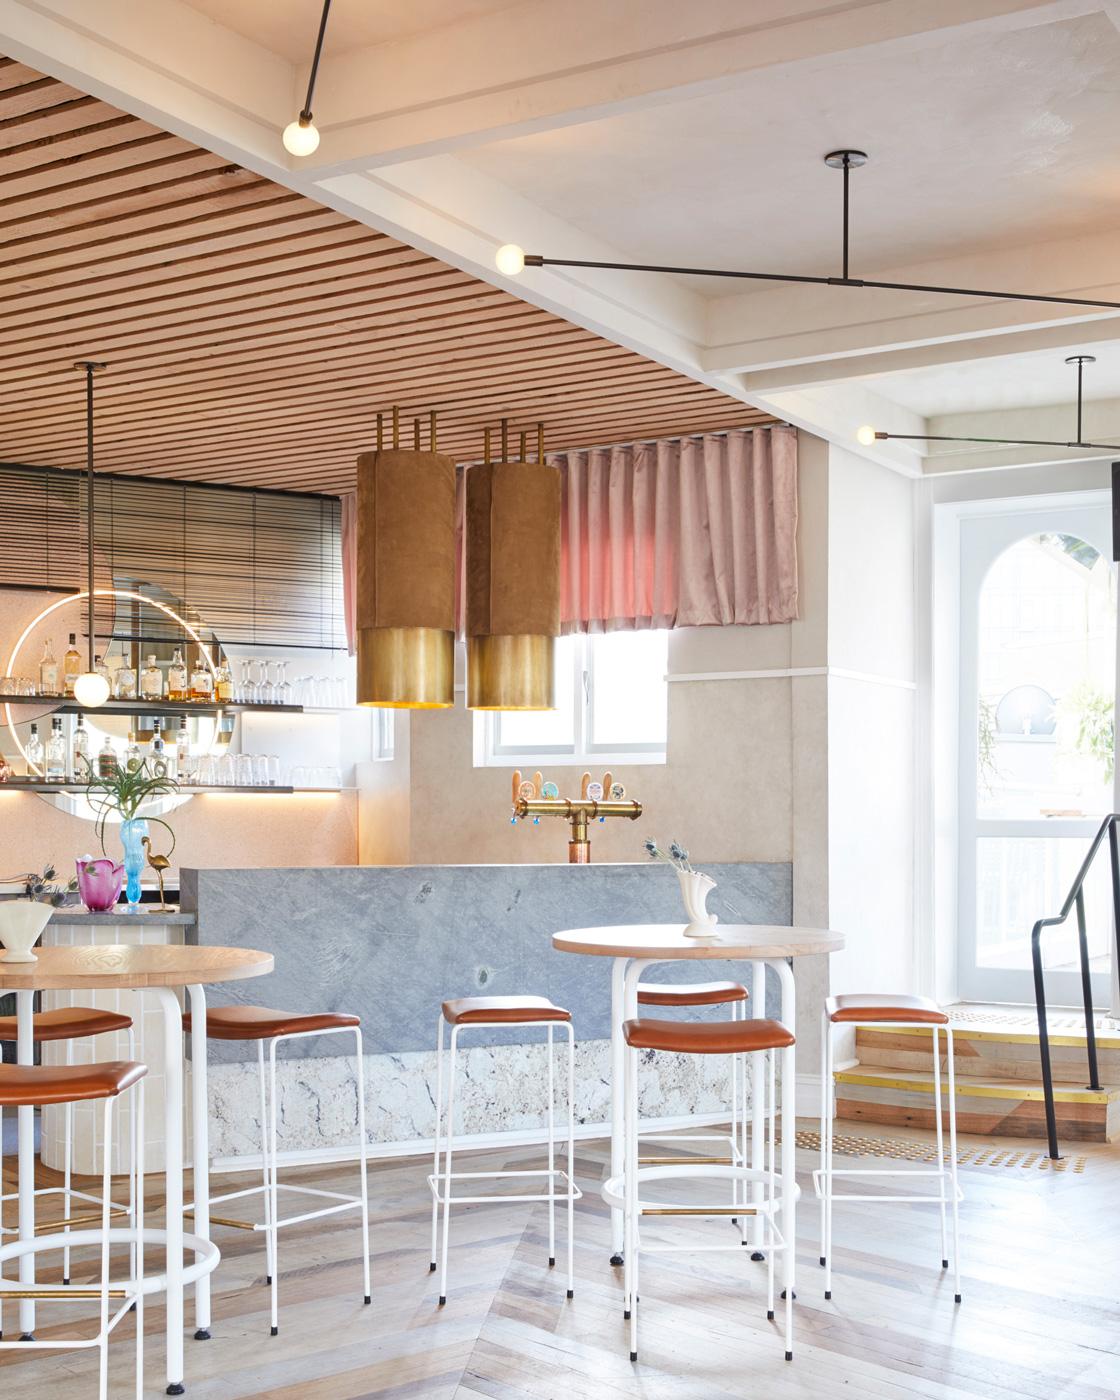 The Rooftop - Killing Matt Woods - Interior Design - Bar Design